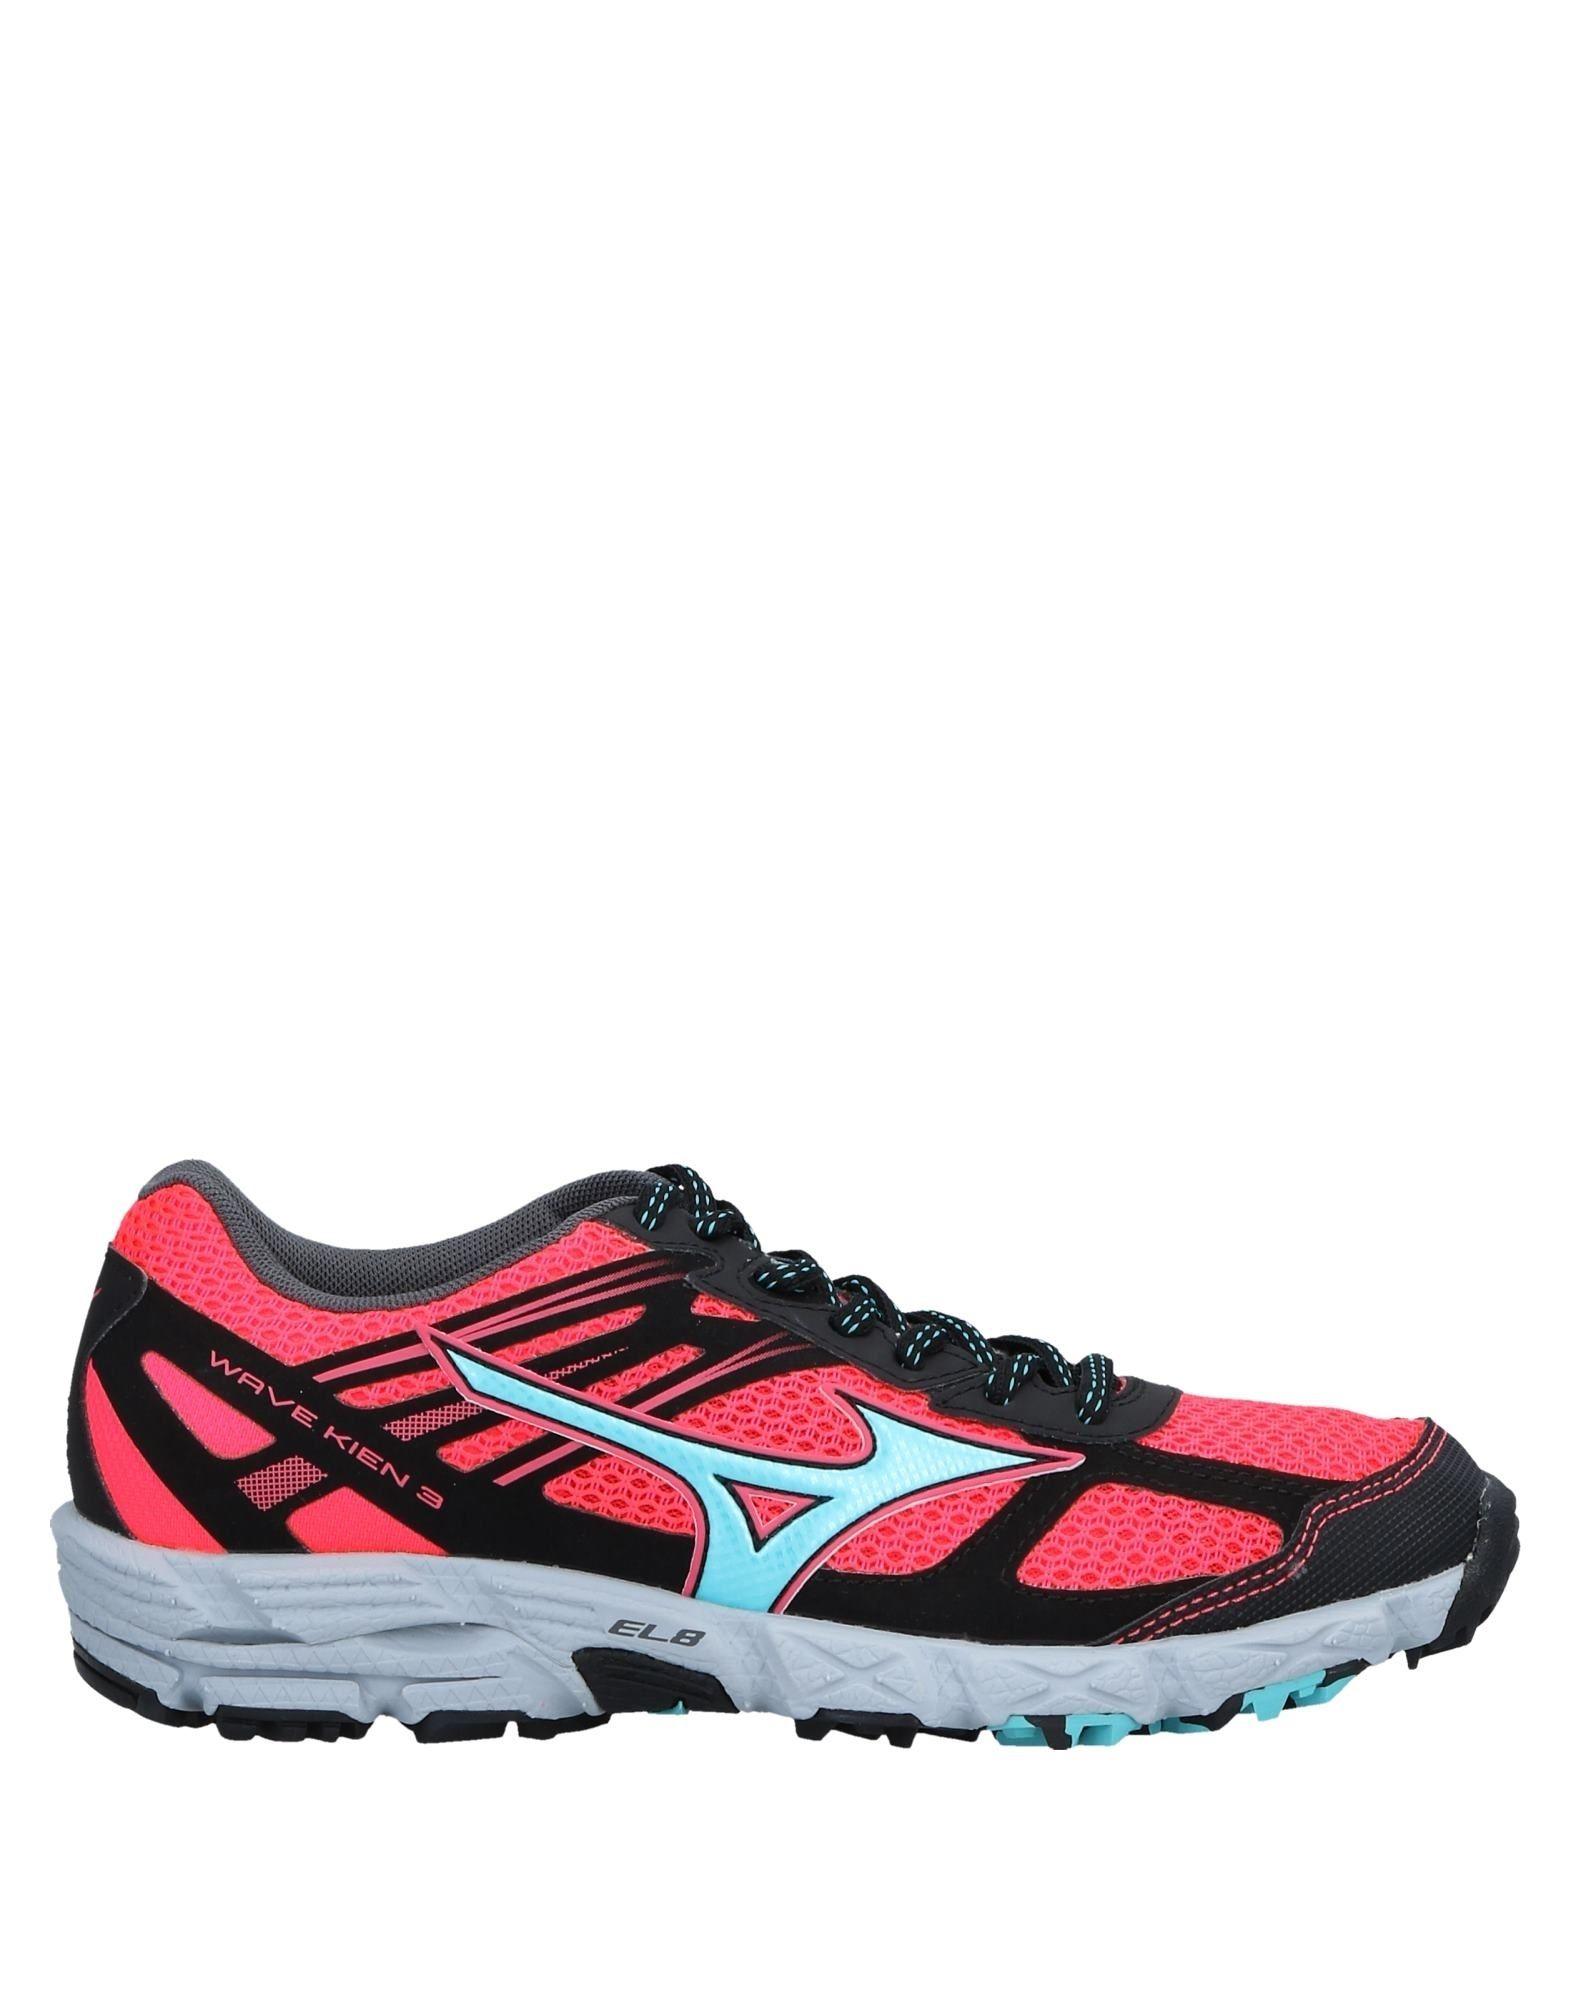 Mizuno Sneakers Damen  11538033LD Gute Qualität beliebte Schuhe